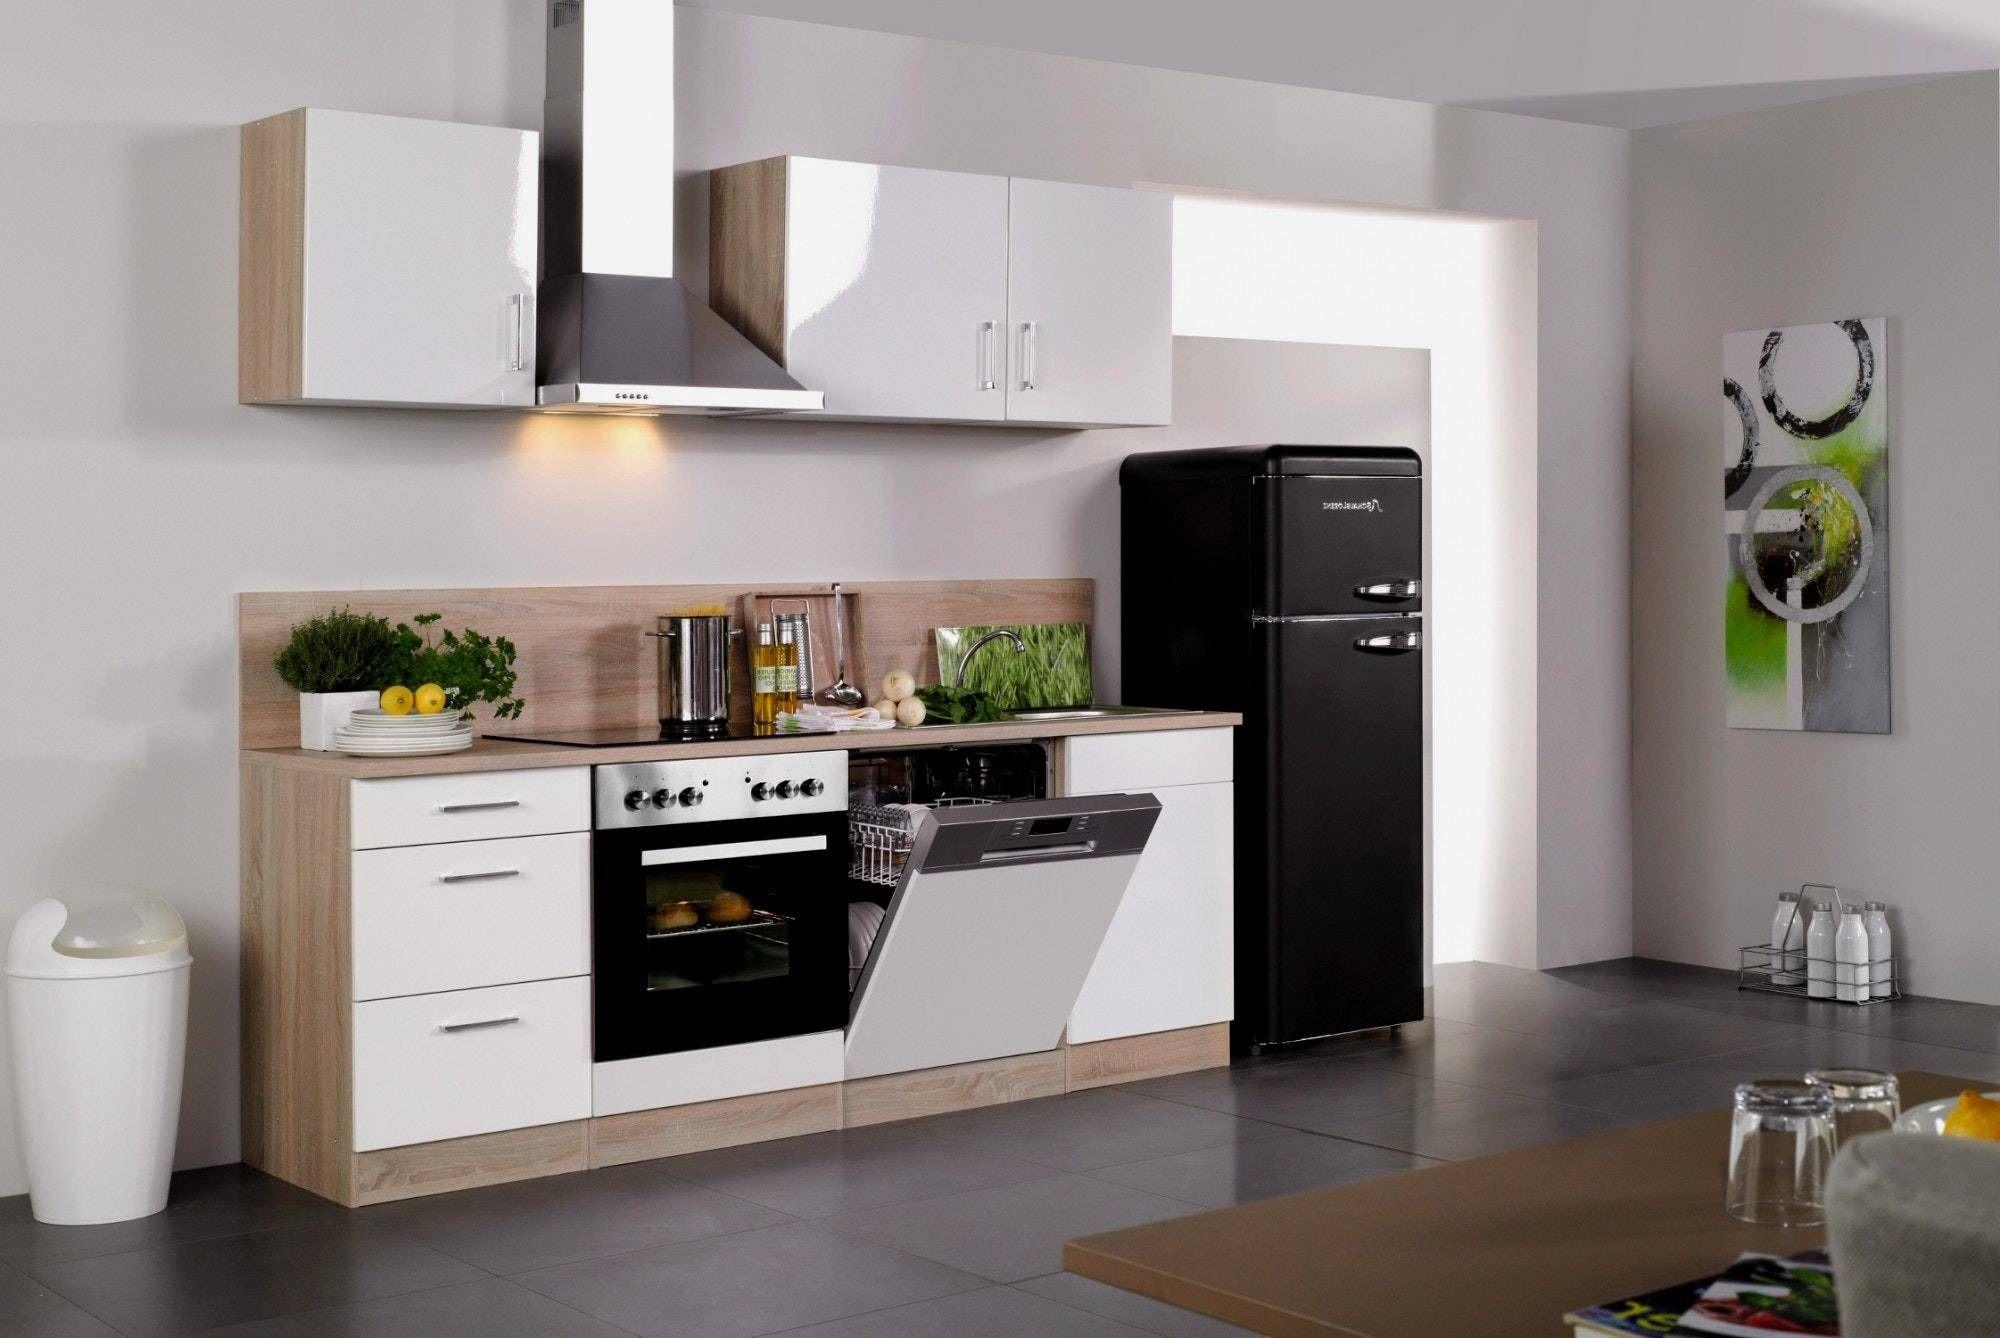 Full Size of Küche Mit Allen Elektrogeräten Küche Mit Elektrogeräten Und Spülmaschine Küche Mit Elektrogeräten Und Waschmaschine Küche Mit Elektrogeräten Unter 1000 € Küche Eckküche Mit Elektrogeräten